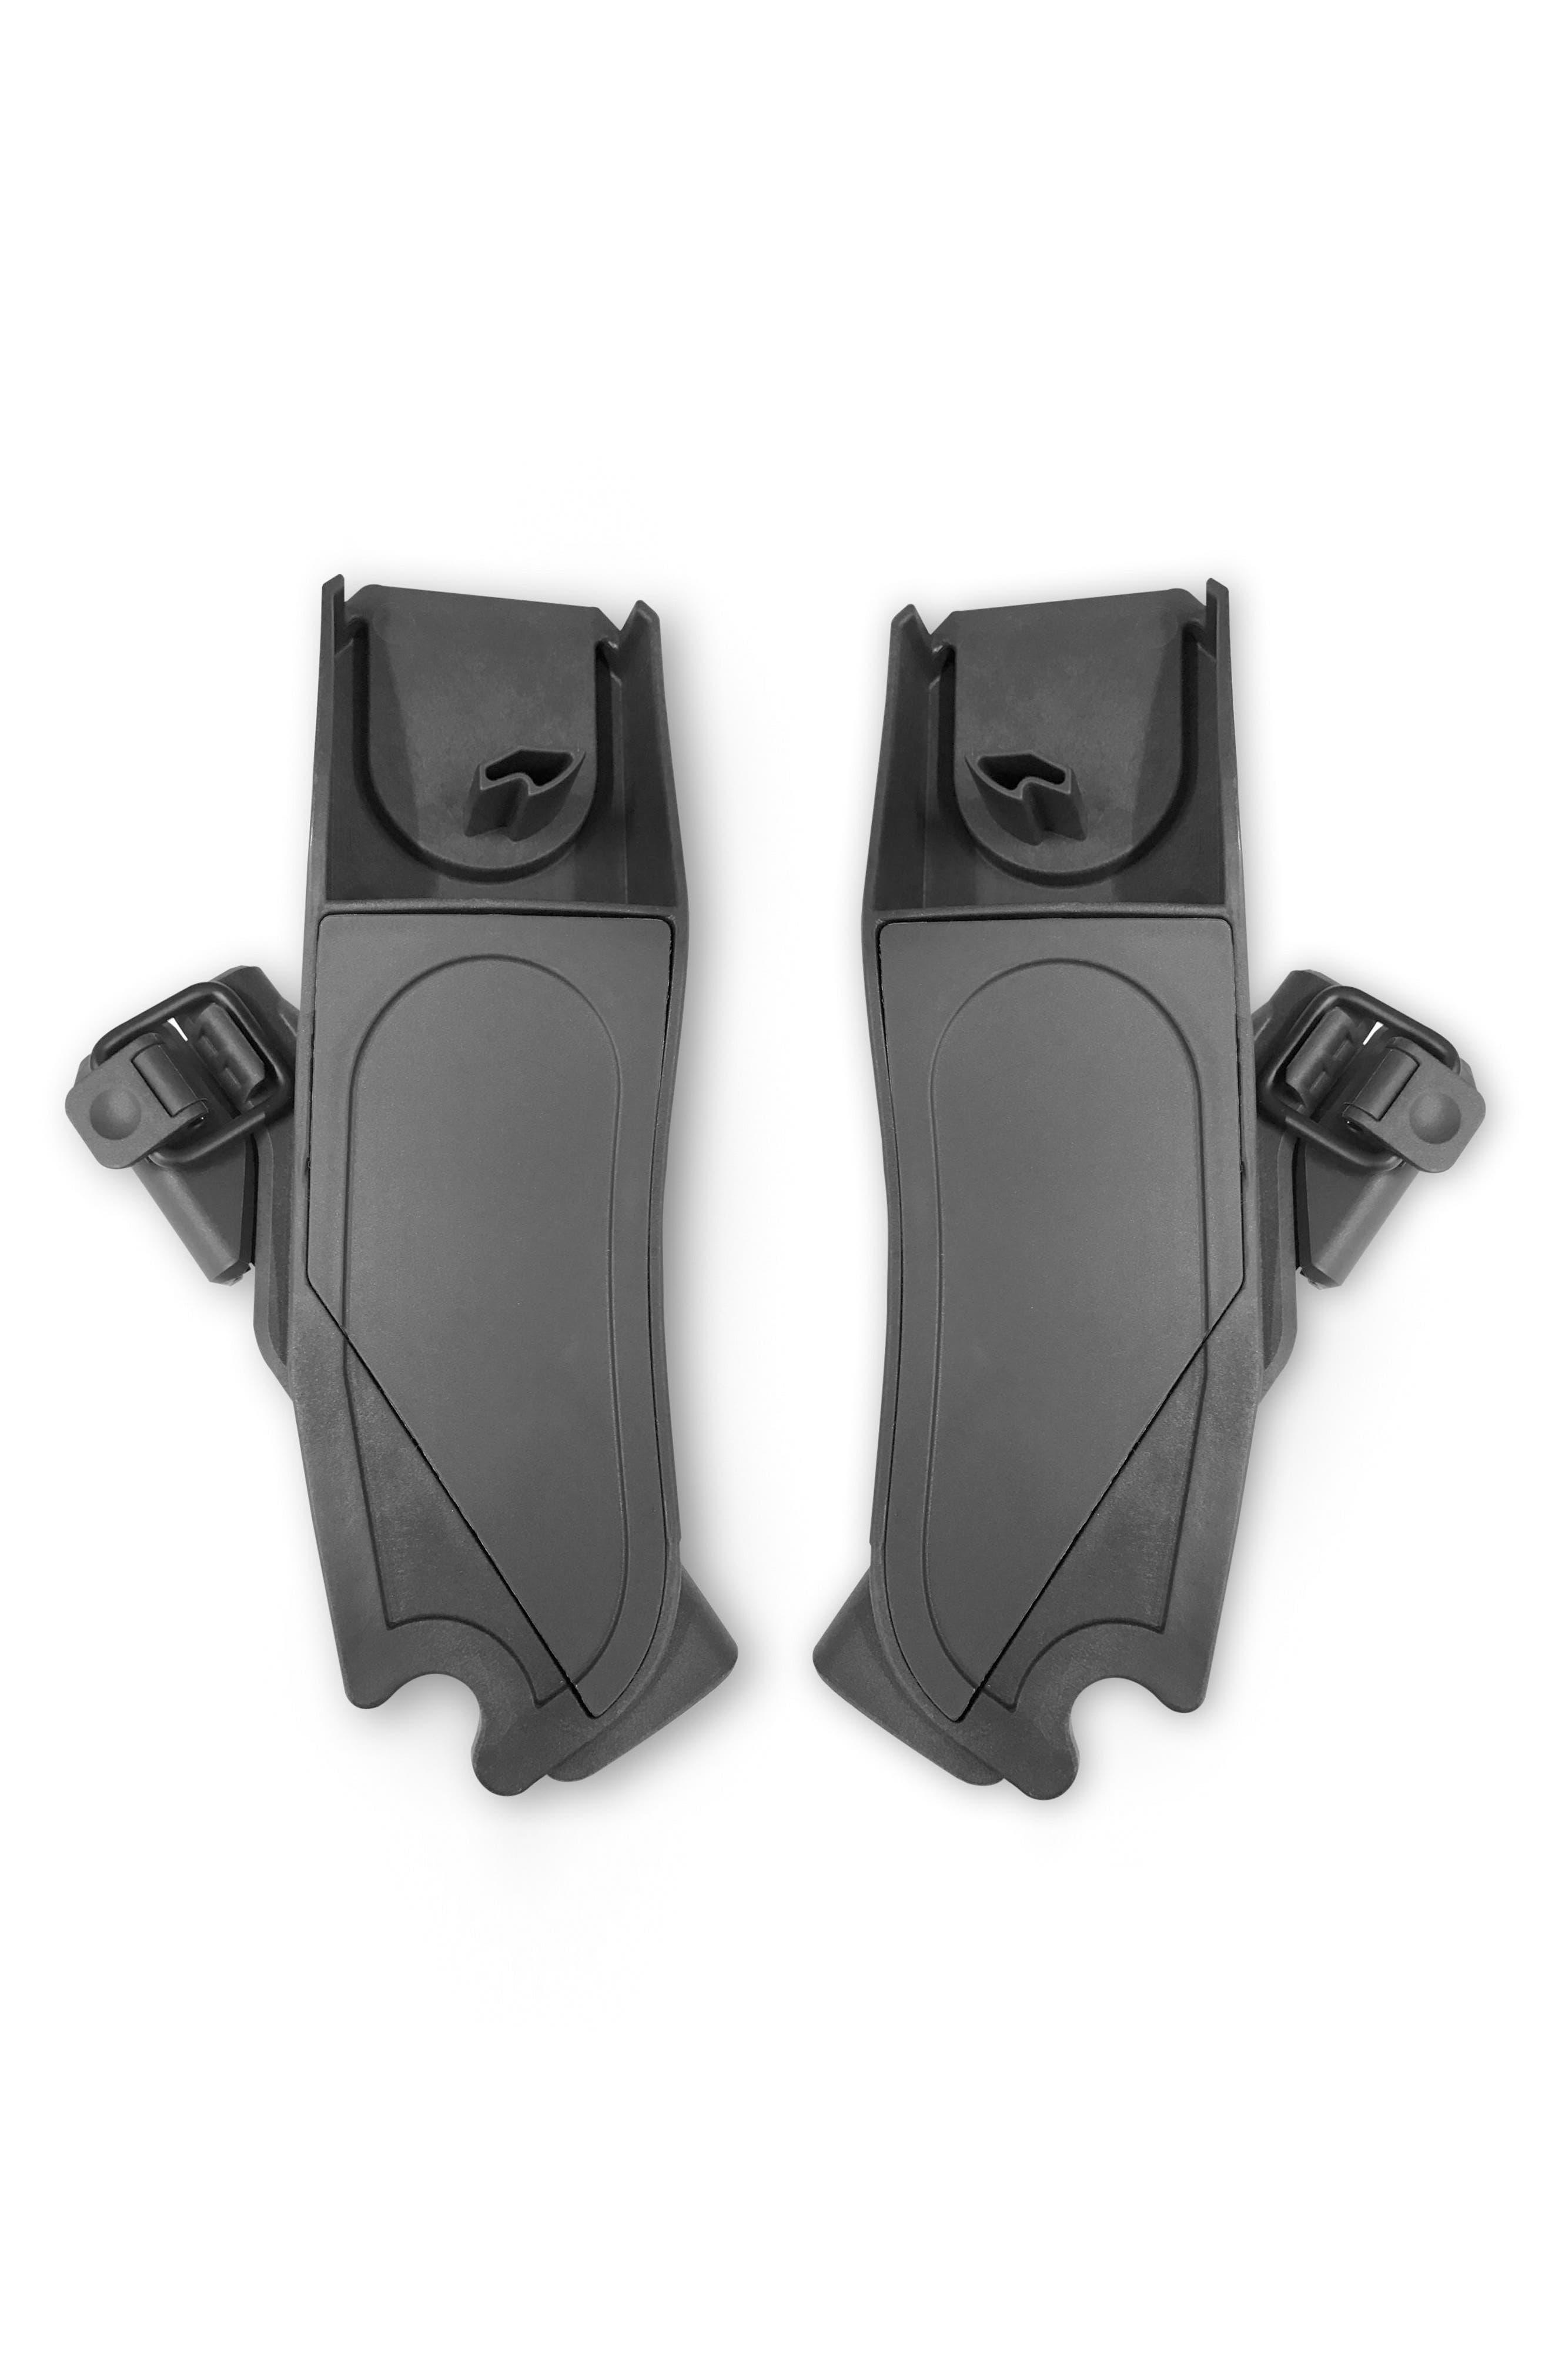 Lower Maxi-Cosi<sup>®</sup>/Nuna Car Seat Adapter,                             Main thumbnail 1, color,                             BLACK